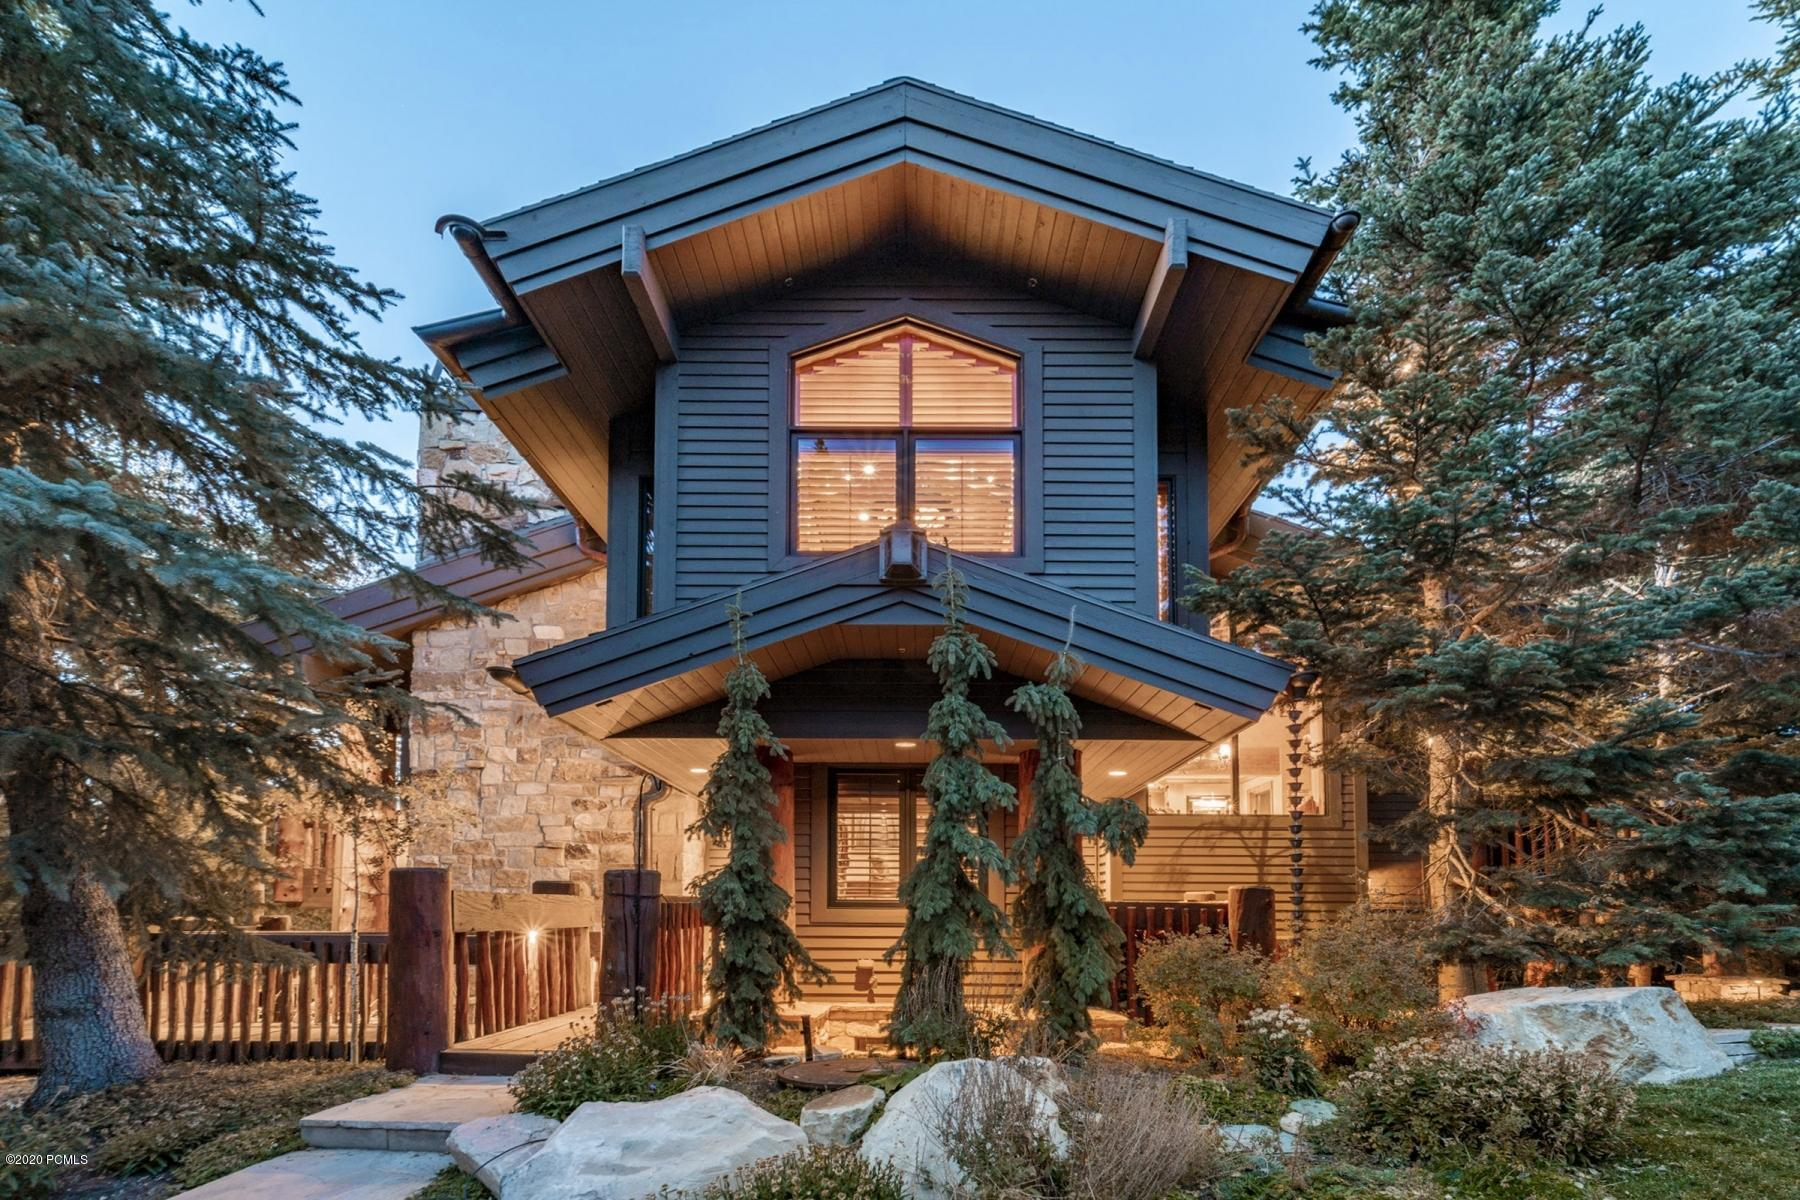 8165 Royal St E, Park City, Utah 84060, 5 Bedrooms Bedrooms, ,6 BathroomsBathrooms,Condominium,For Sale,Royal St E,12004144